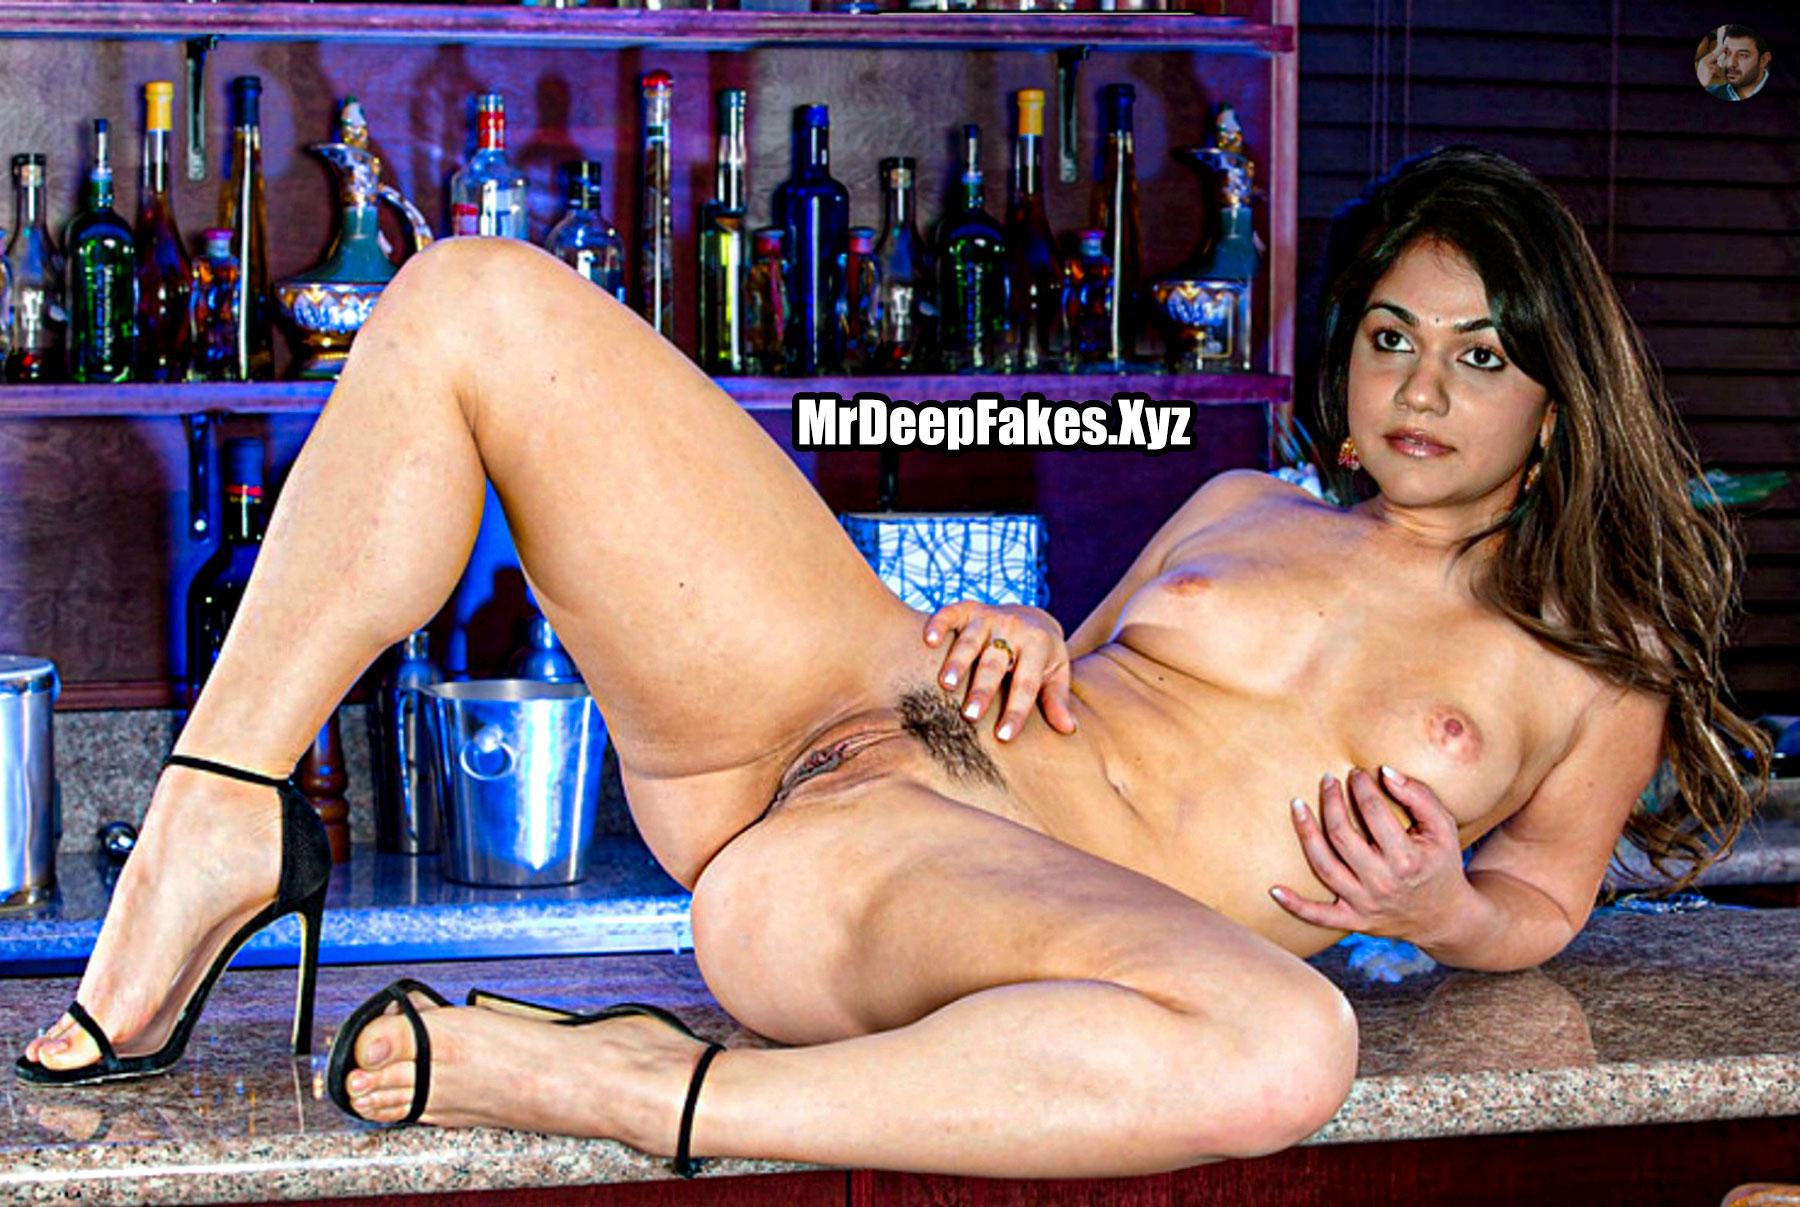 Naked Allu Arjun wife Sneha Reddy hairy pussy sexy body fake pic